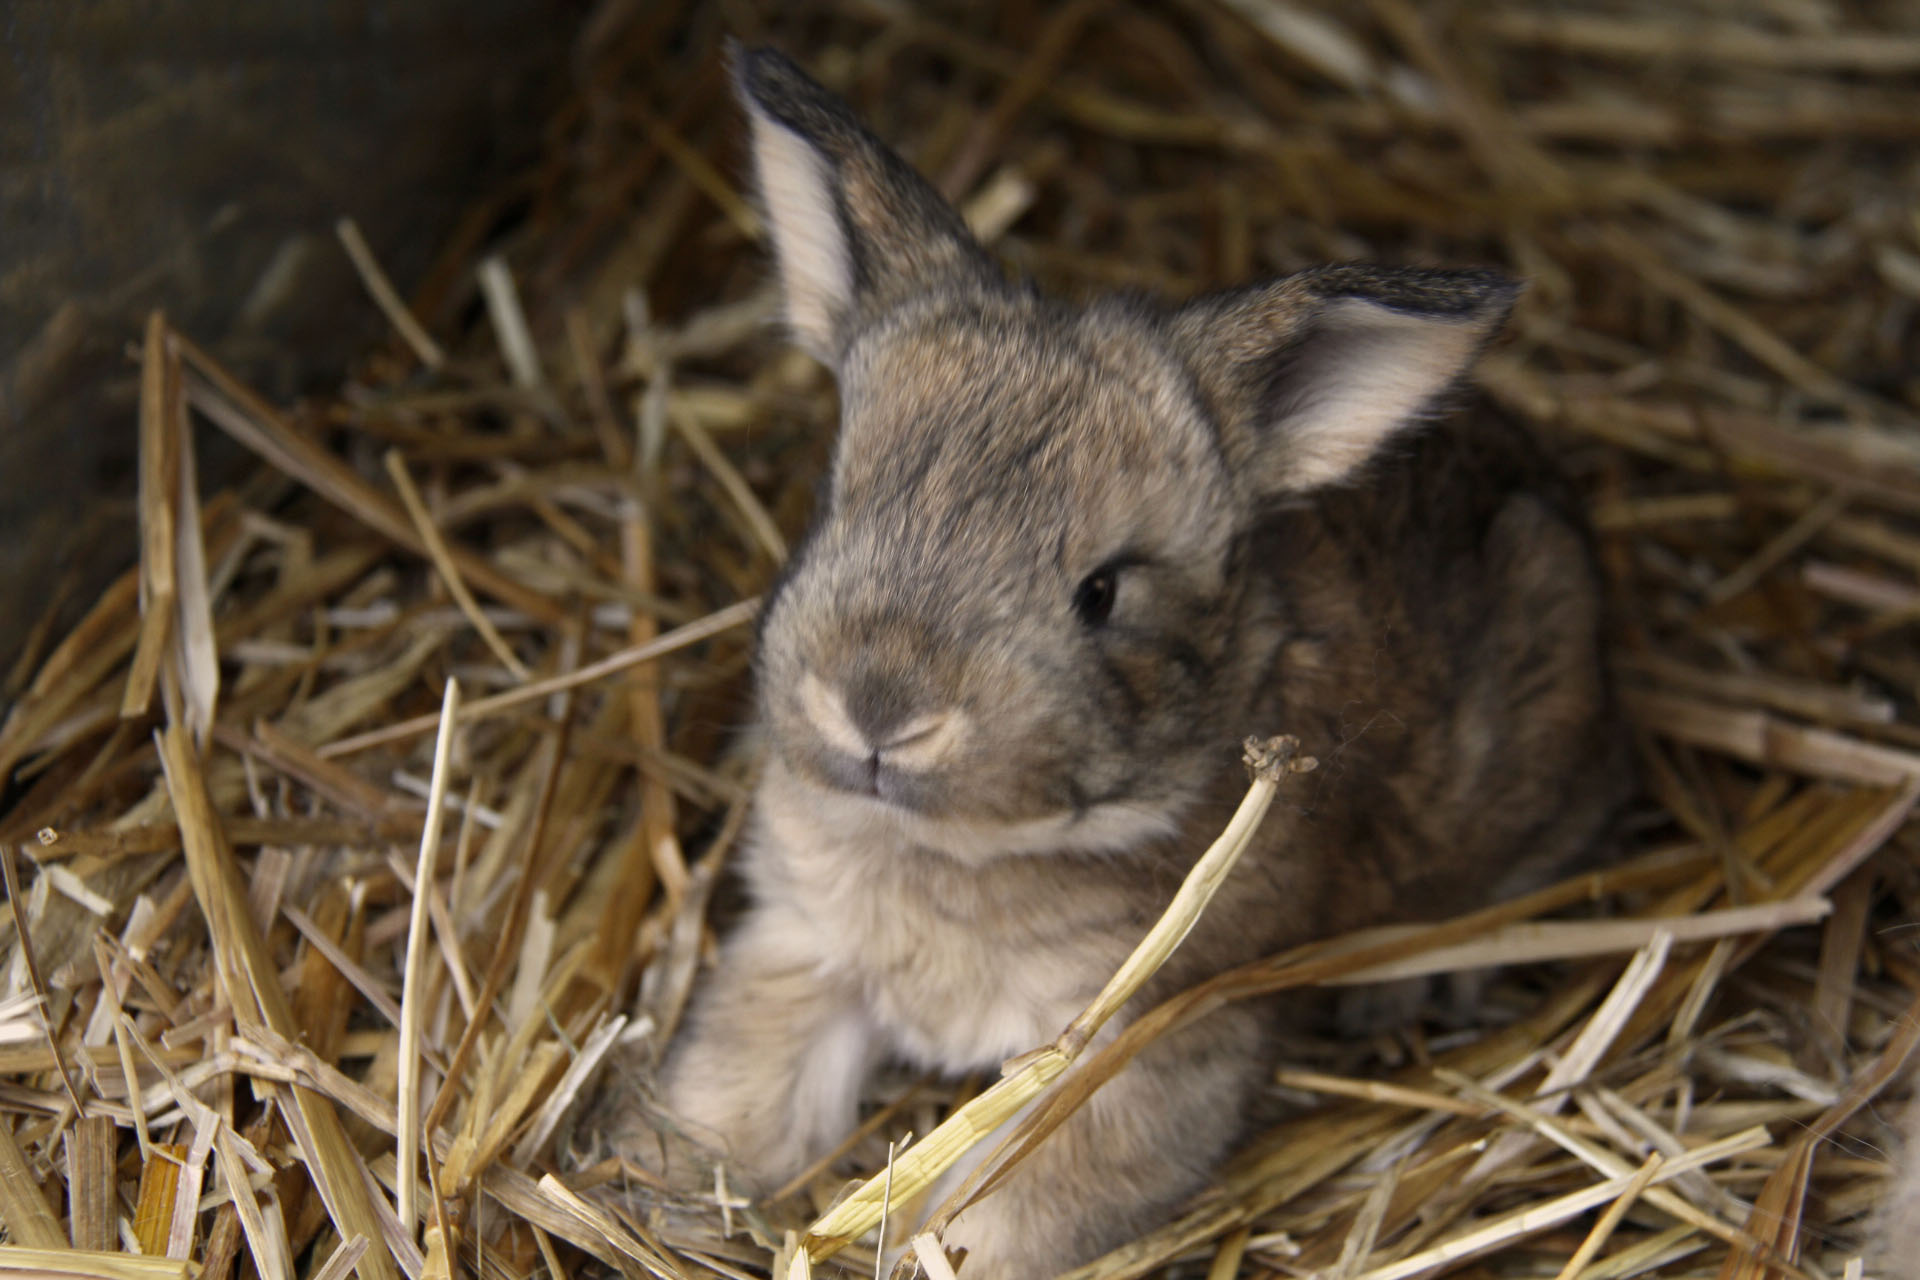 Baby angora rabbits